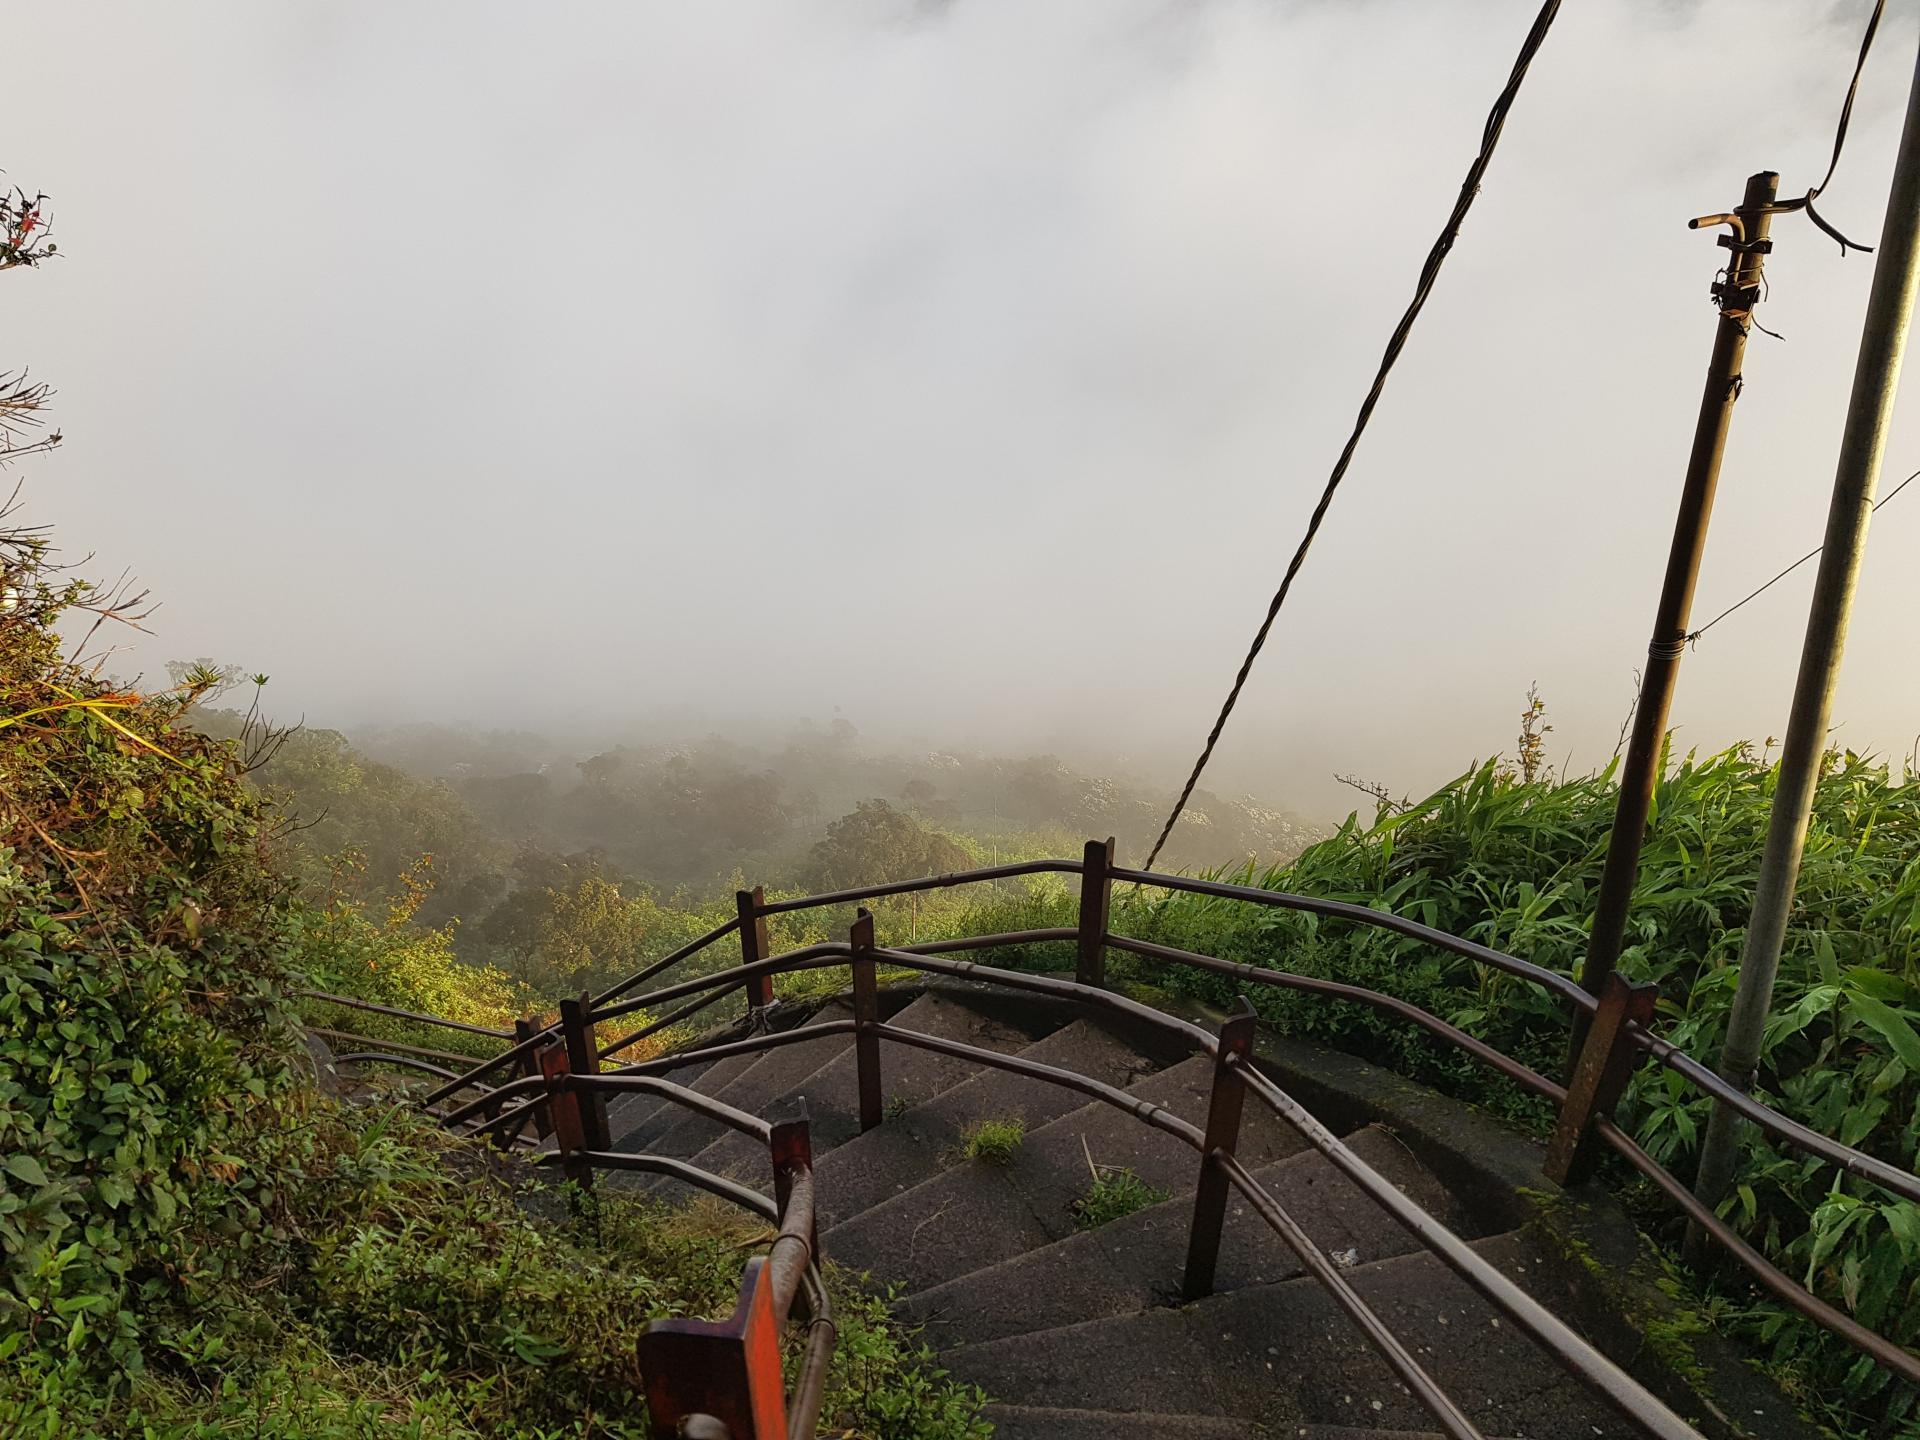 Лестница в облака. Пик Адама, Шри-Ланка.